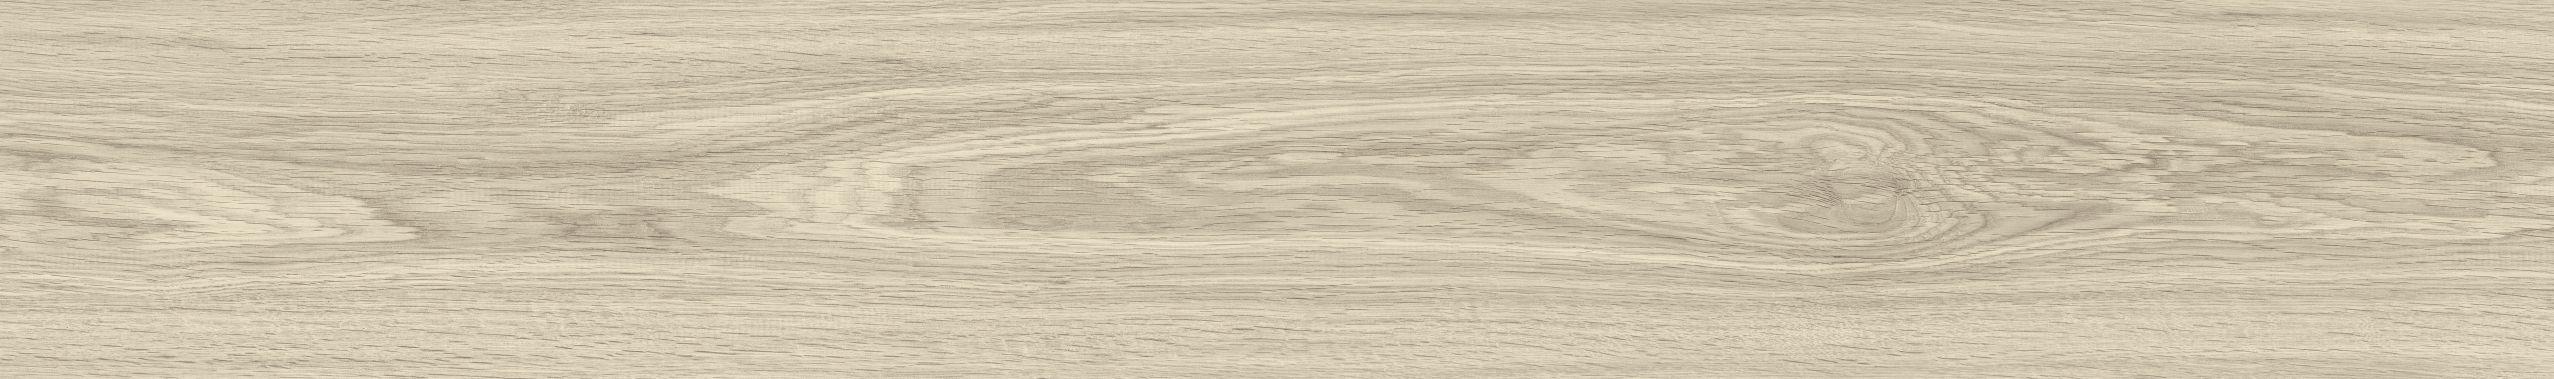 Panele winylowe LVT modulari ® WOOD DRYBACK 19,6 x 132 cm 24123